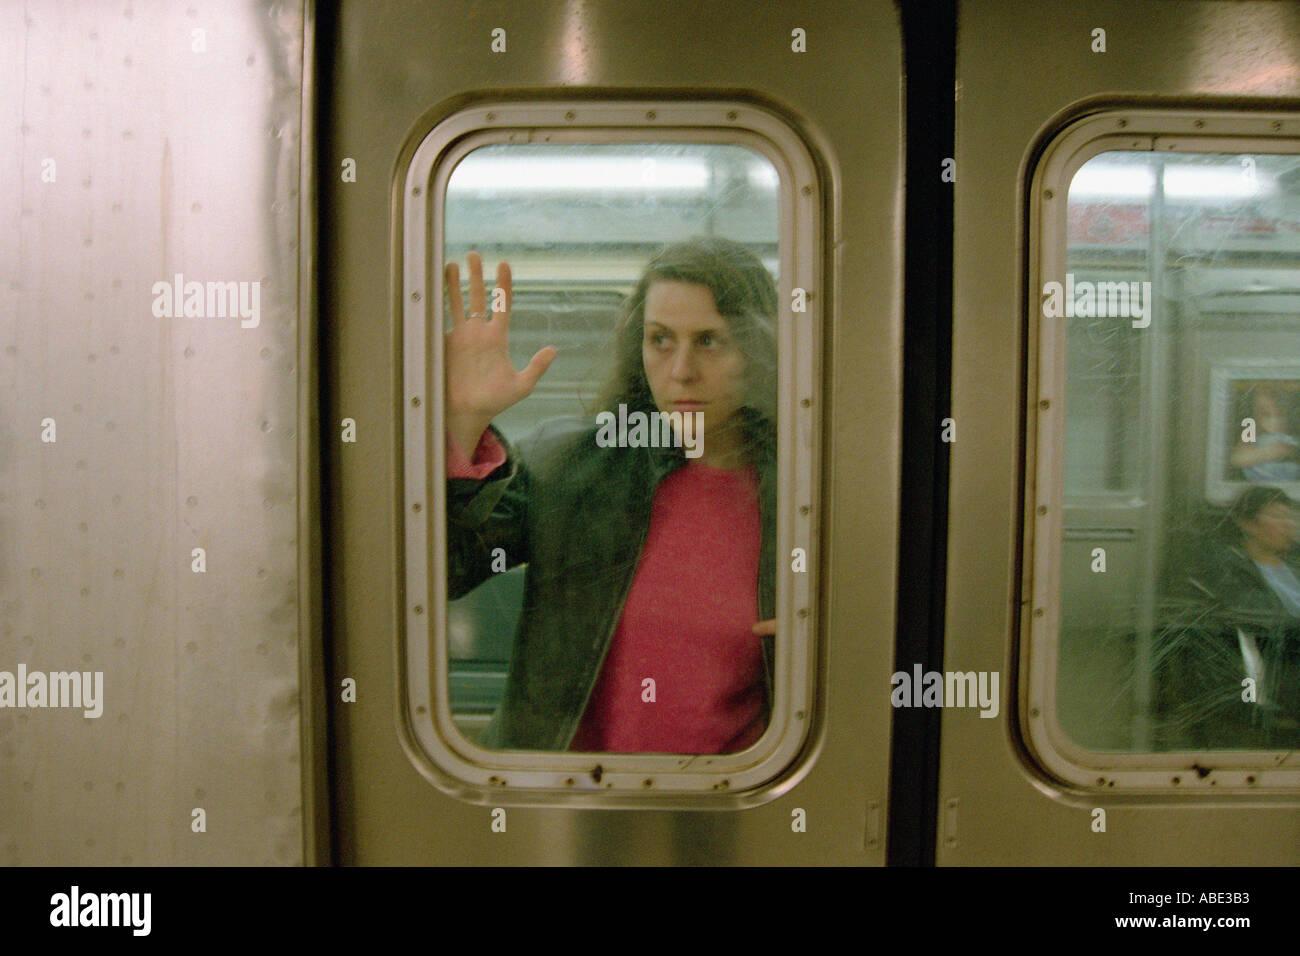 Female commuter on subway train - Stock Image